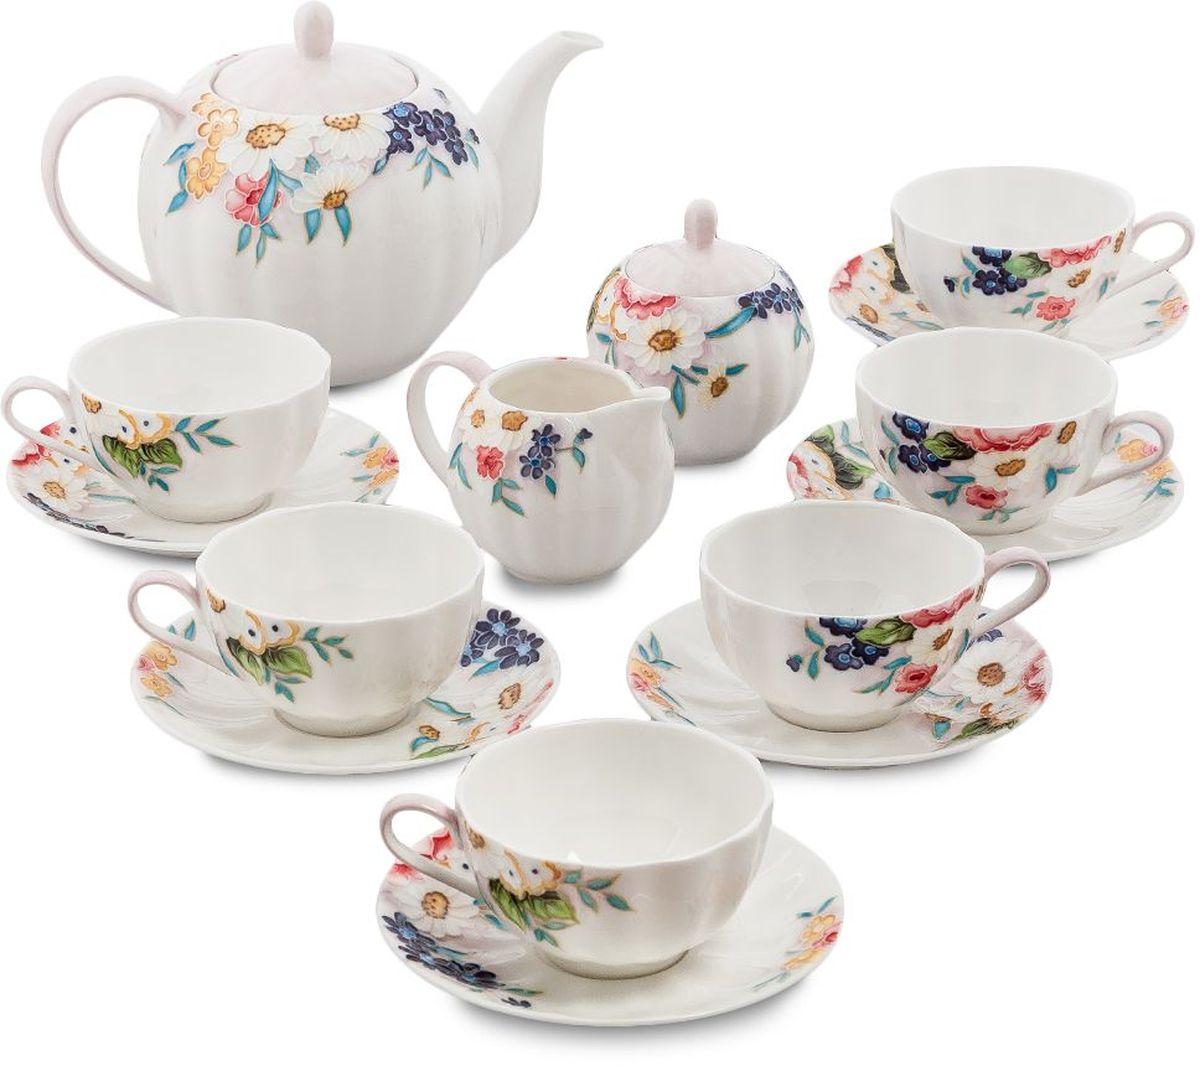 Сервиз чайный Pavone Королева Камилла, 15 предметов. 451589451589Объем чайника: 1 л Объем сахарницы: 200 мл Объем молочника: 200 мл Объем чашки: 150 мл Диаметр блюдца: 14 см.